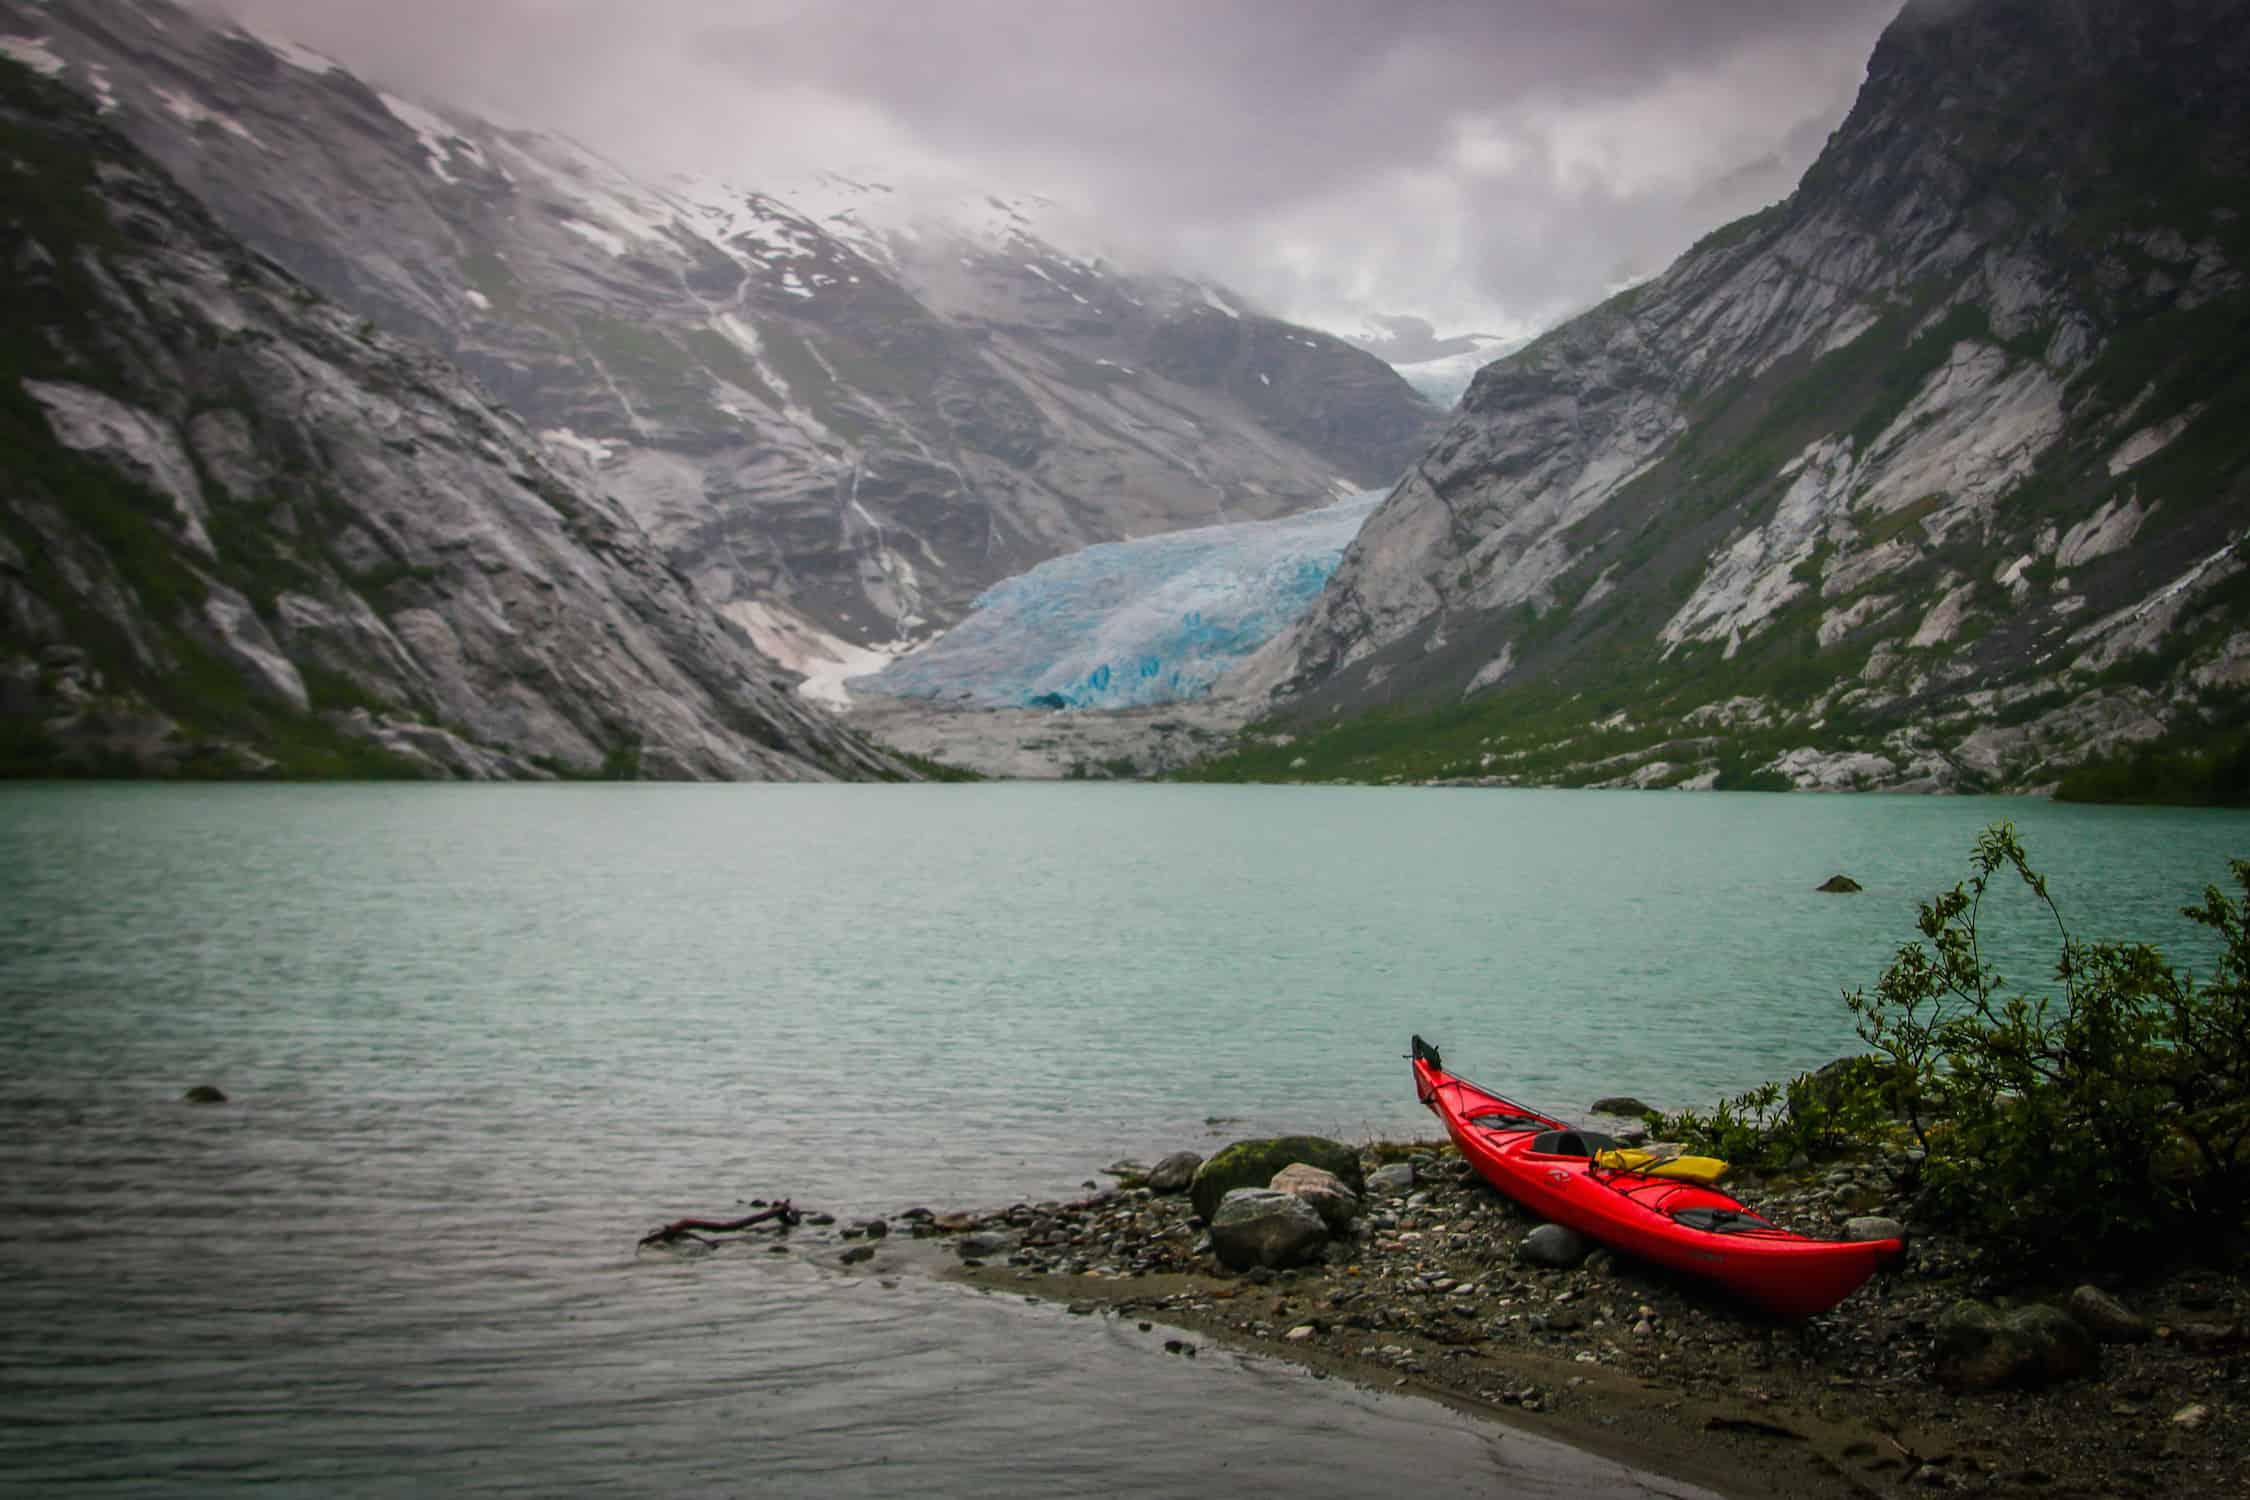 Fjords of Norway: Jostedalsbreen Glacier